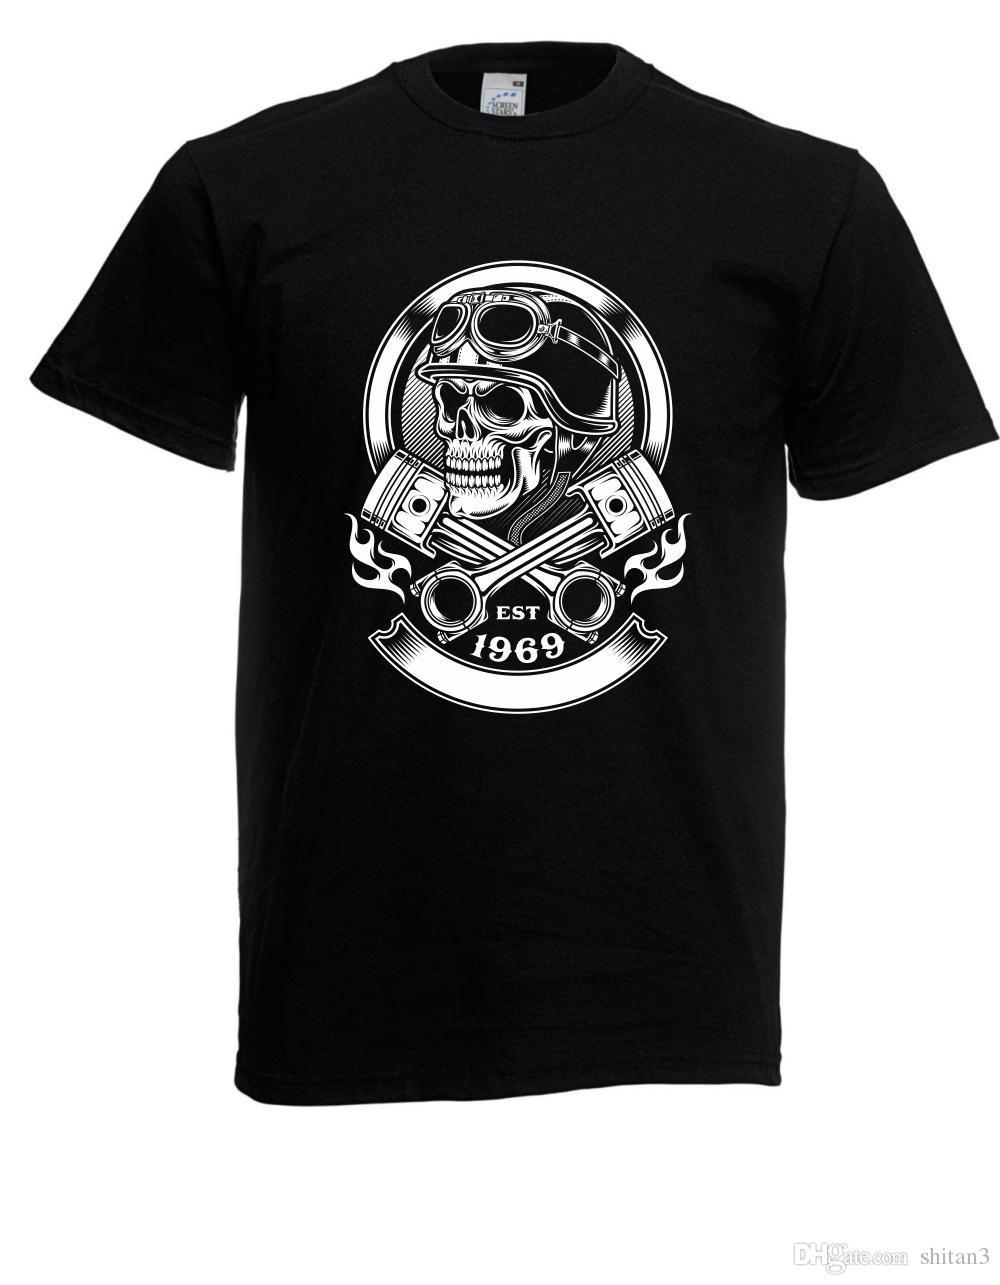 best service 40089 ccdb0 Herren T-Shirt Vintage Biker Skull bis 3XL Round Collar Short Sleeve Tee  Shirts top tee Men T Shirt 100% Cotton Print Shirts